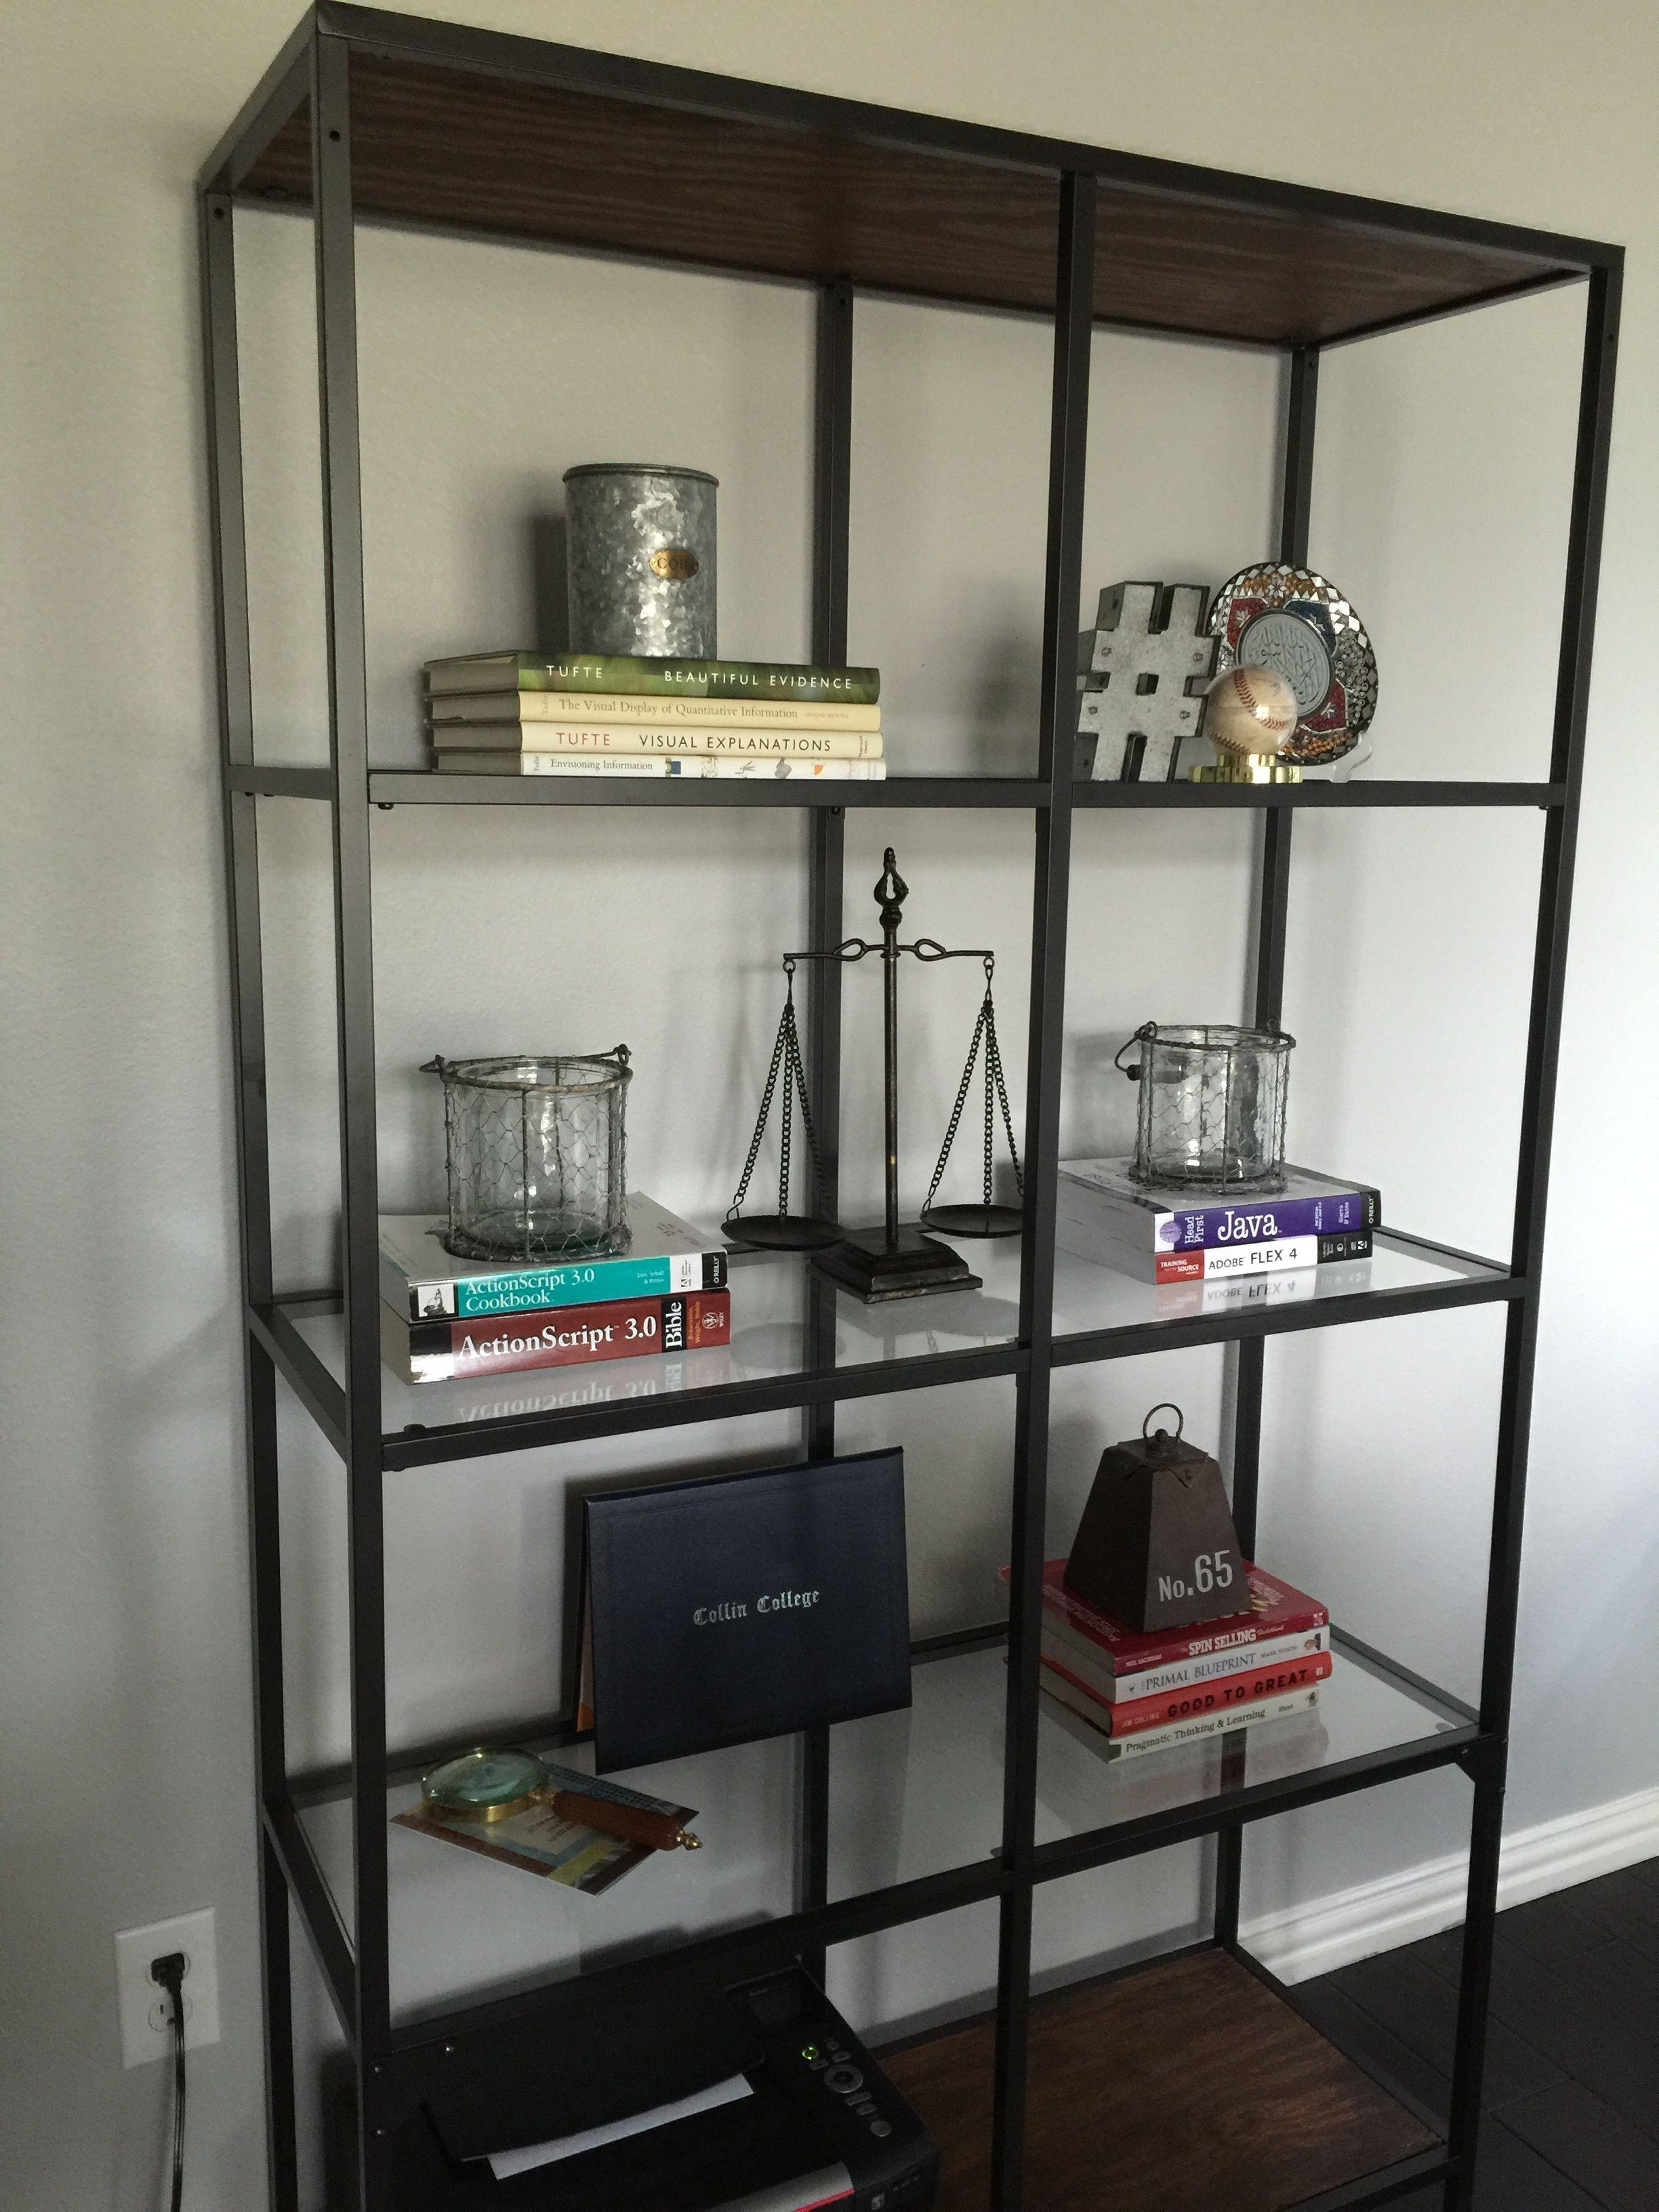 ikea vittsjo bookshelves ikea vittsjo ikea ikea hack. Black Bedroom Furniture Sets. Home Design Ideas